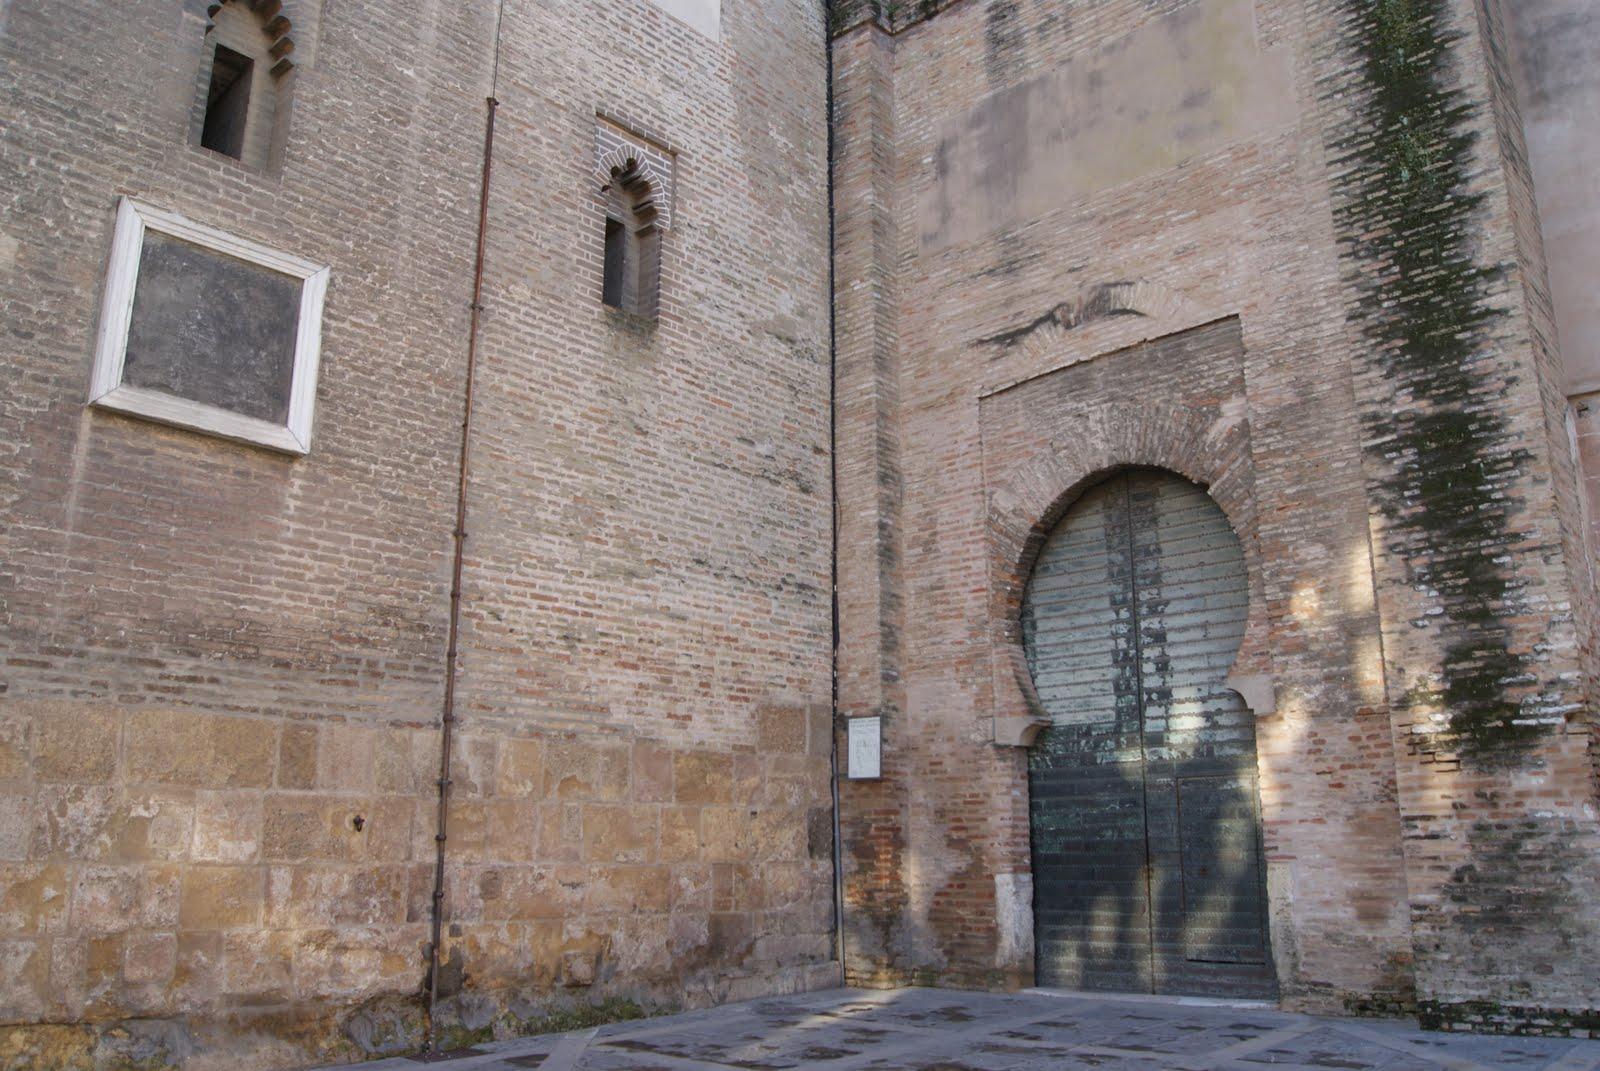 Leyendas de sevilla catedral de santa mar a de la sede de for Exterior catedral de sevilla